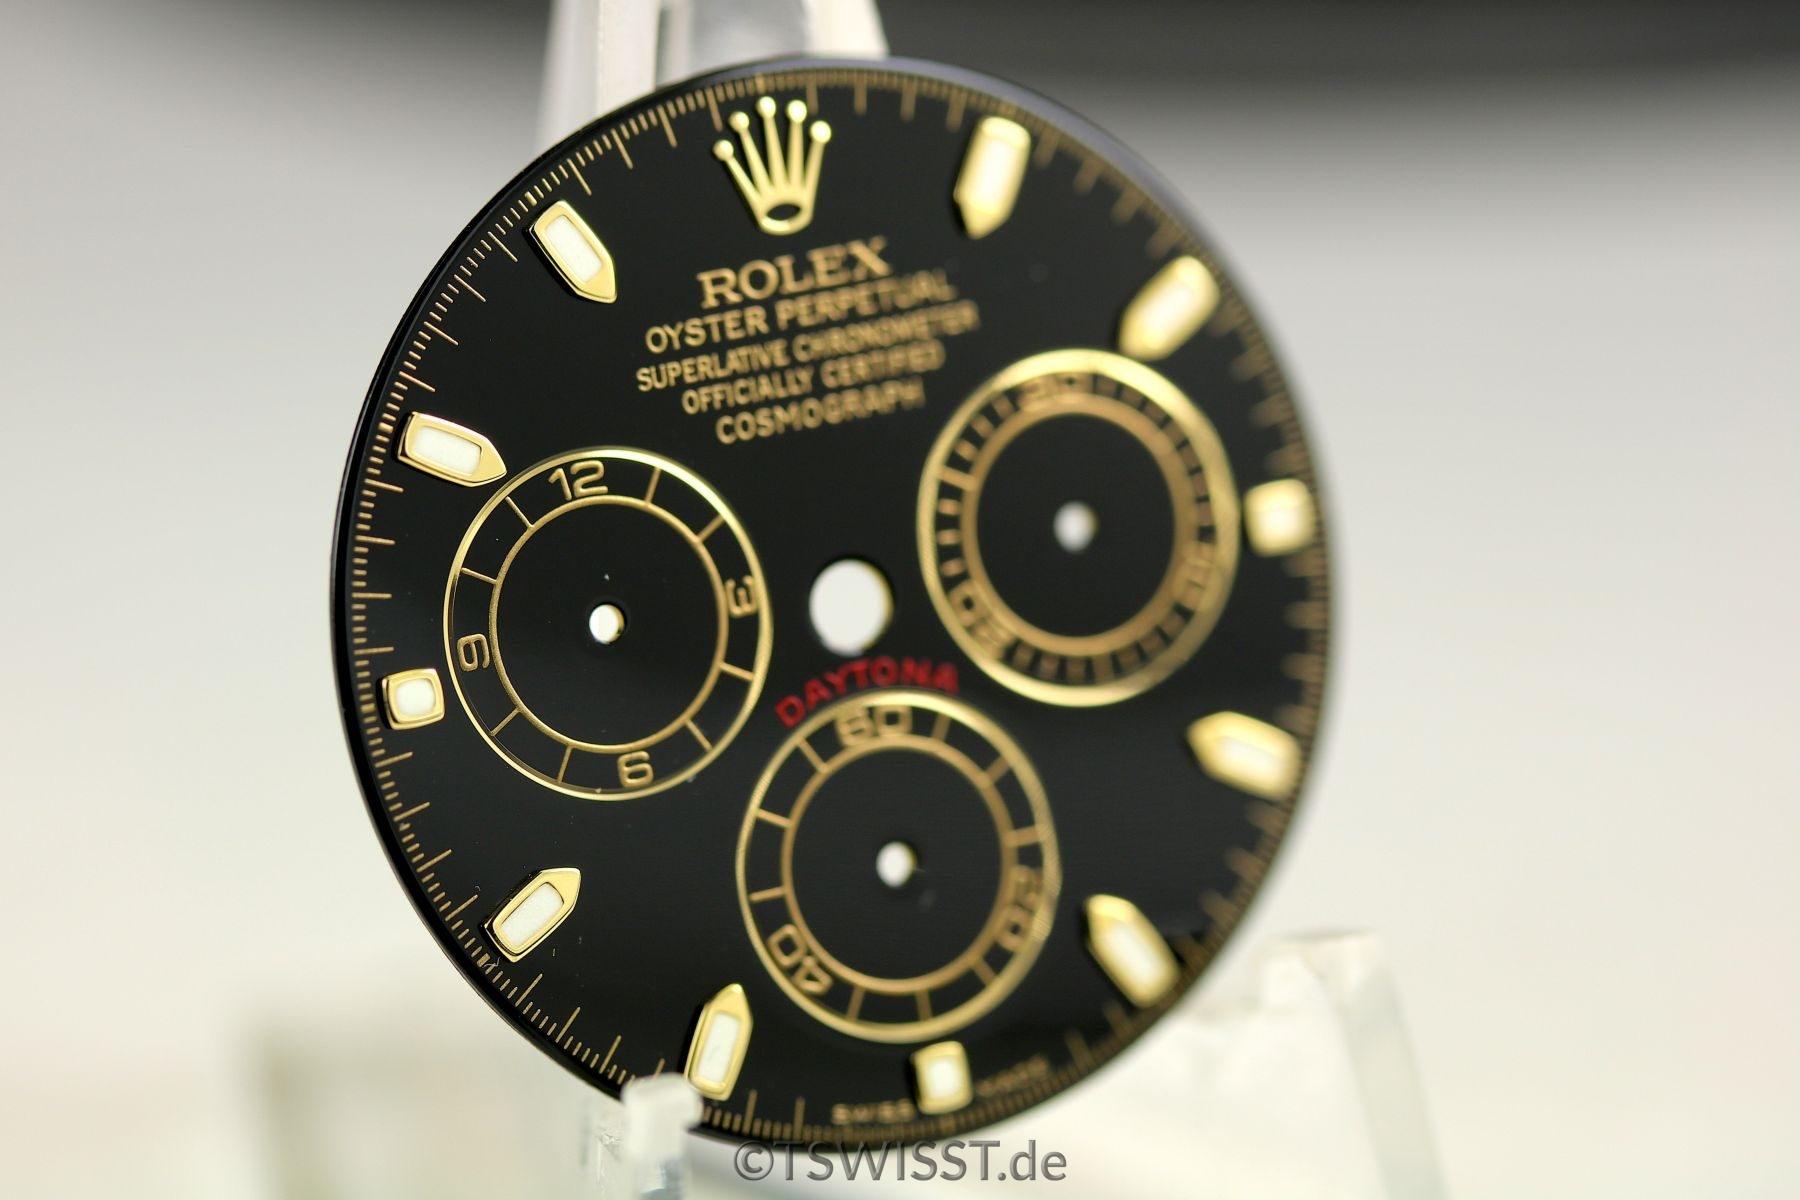 Rolex Daytona dial&hands